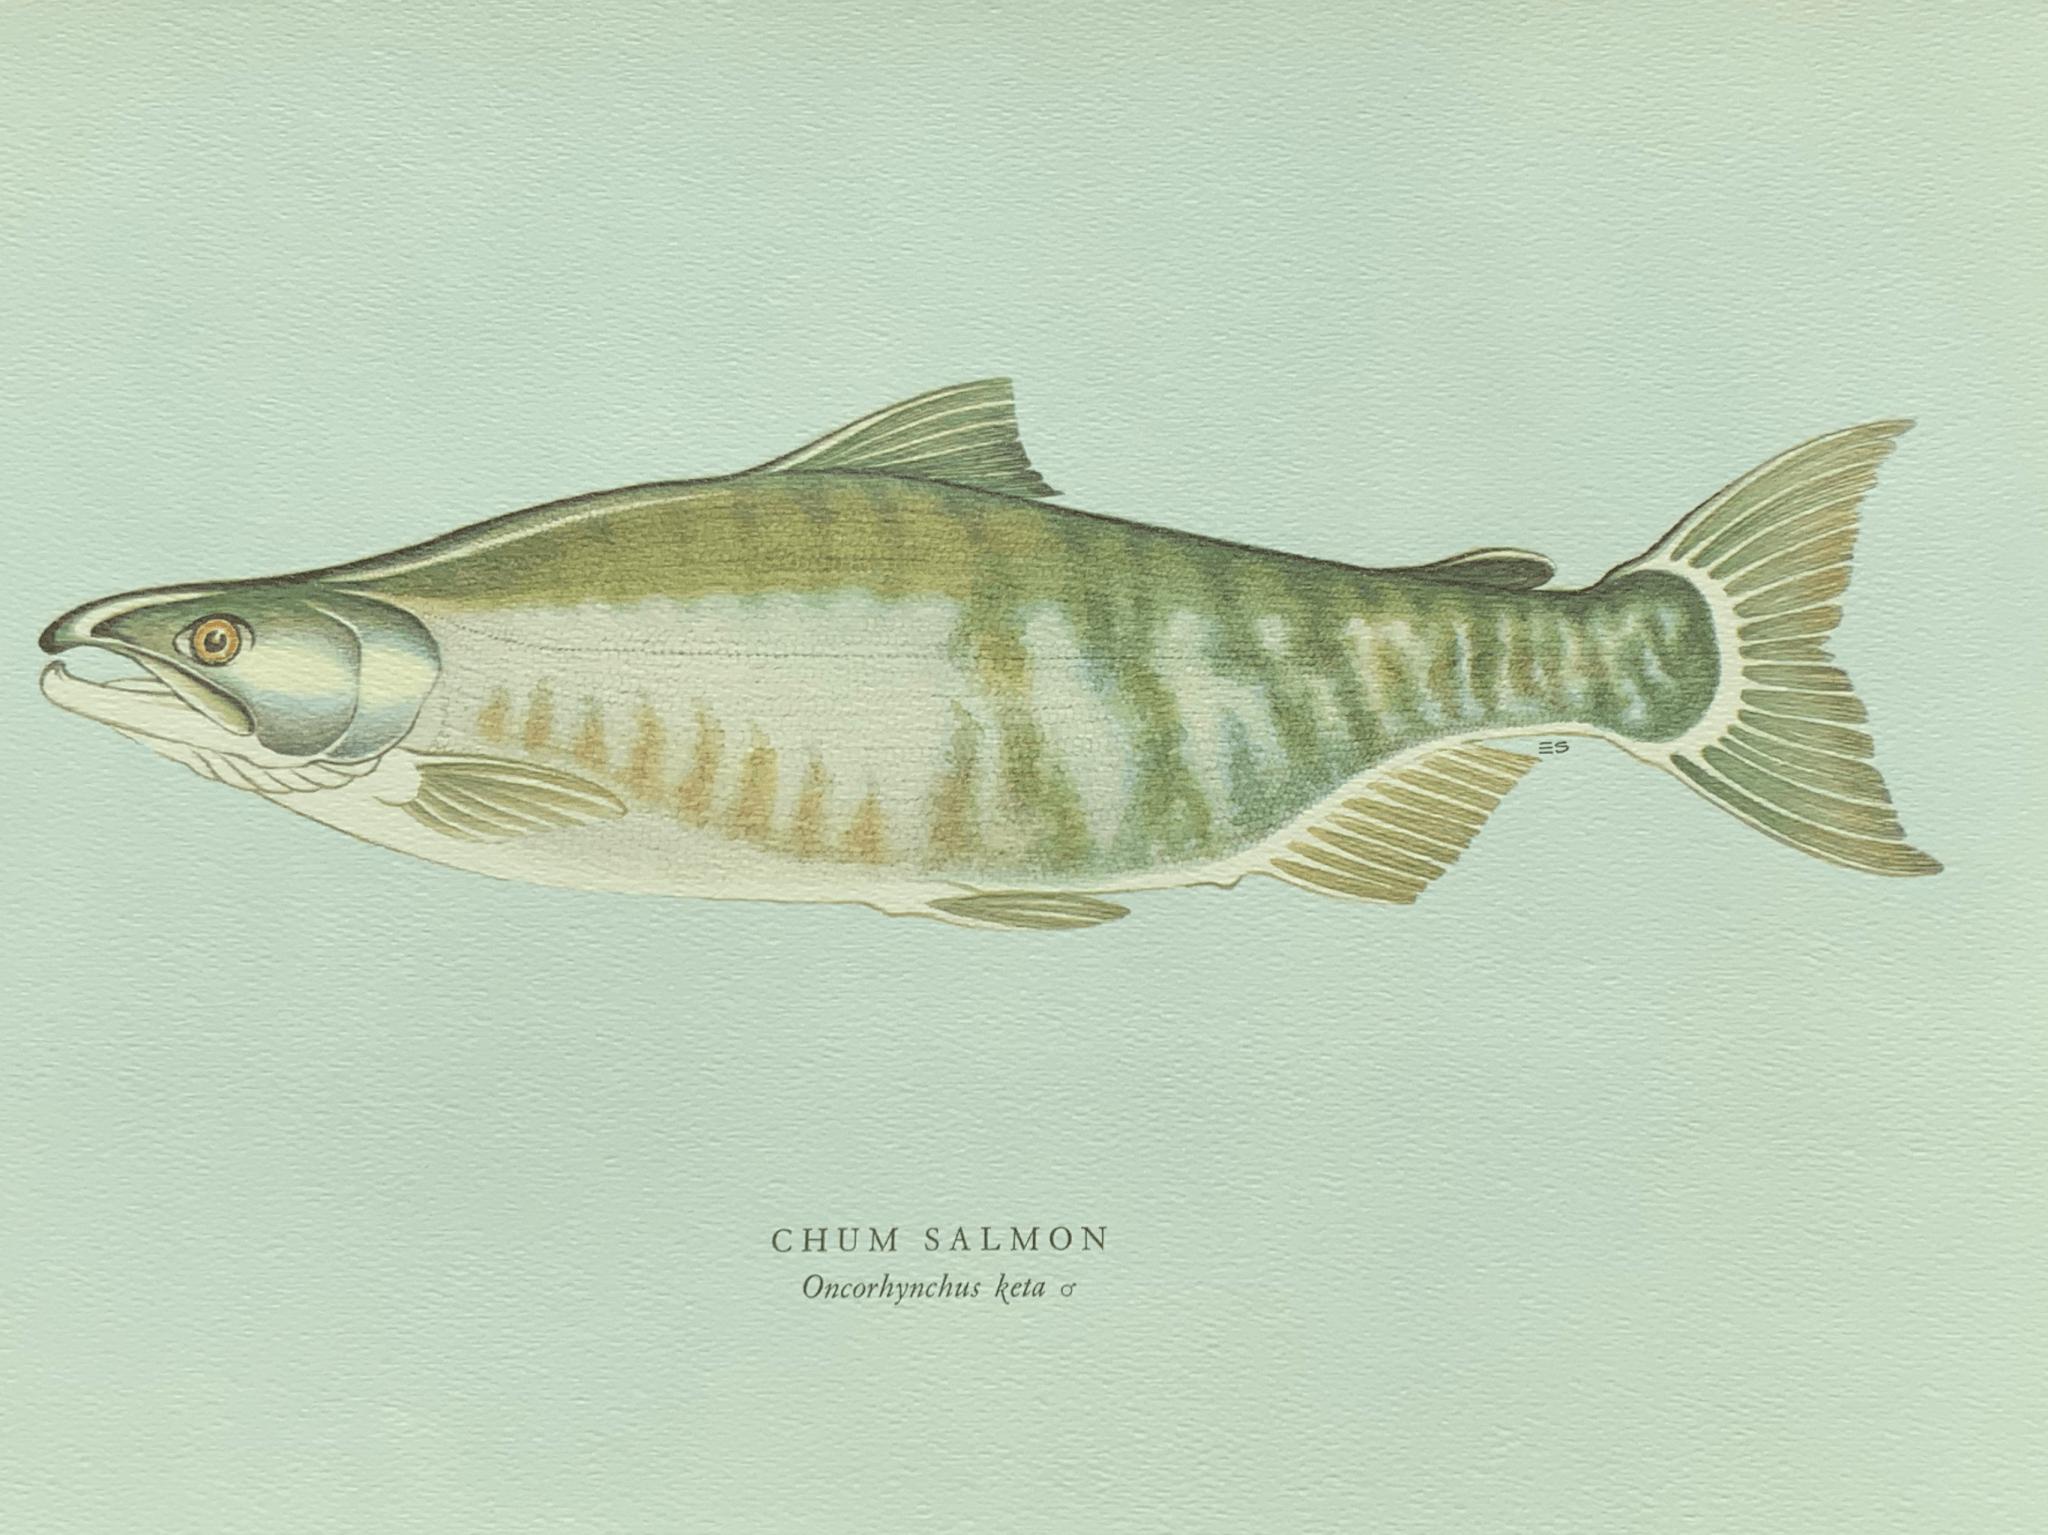 Chum salmon 太平洋鮭魚 太平洋鮭魚一般重八至十磅,出沒於亞拉斯加及西北利亞水域。 韓國和加州也有。